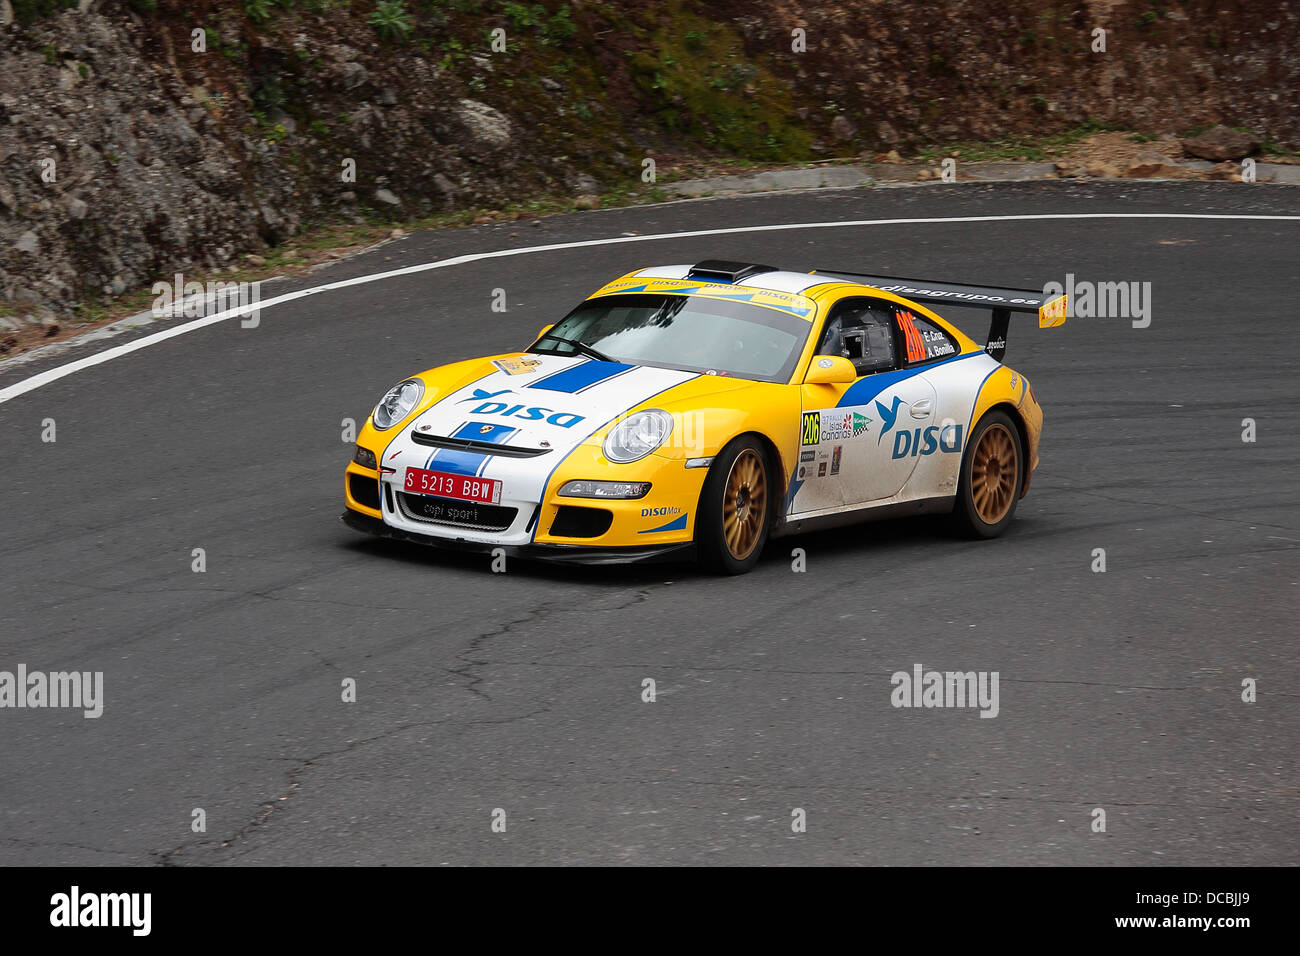 Enrique Cruz and Ariday Bonilla, competing in the ERC Rally Islas Canarias, in Gran Canaria. - Stock Image